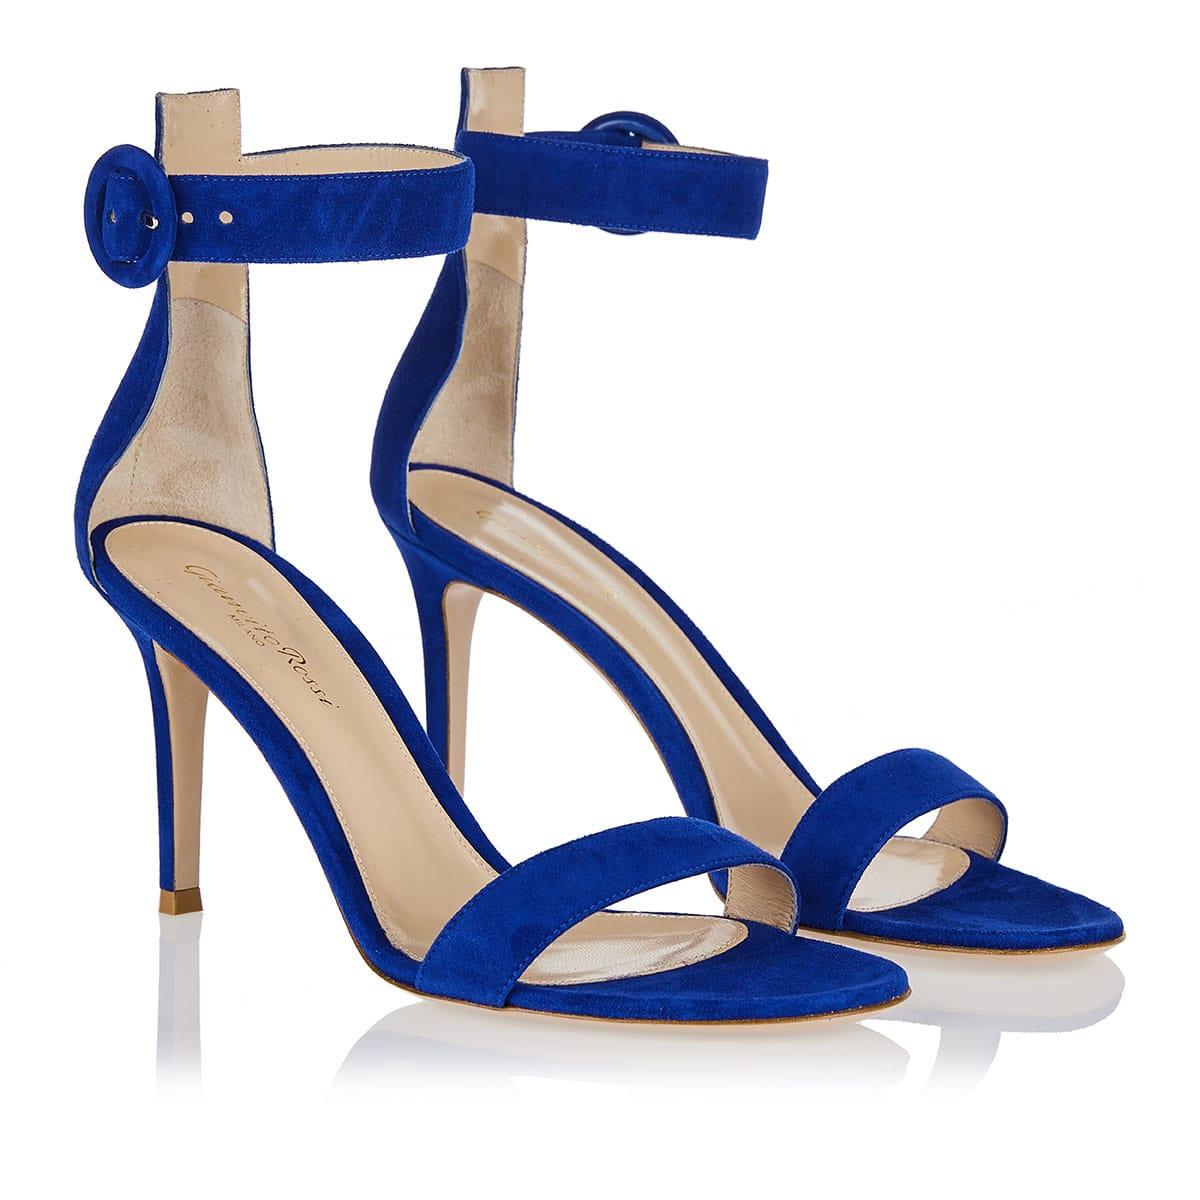 Portofino 85 suede leather sandals